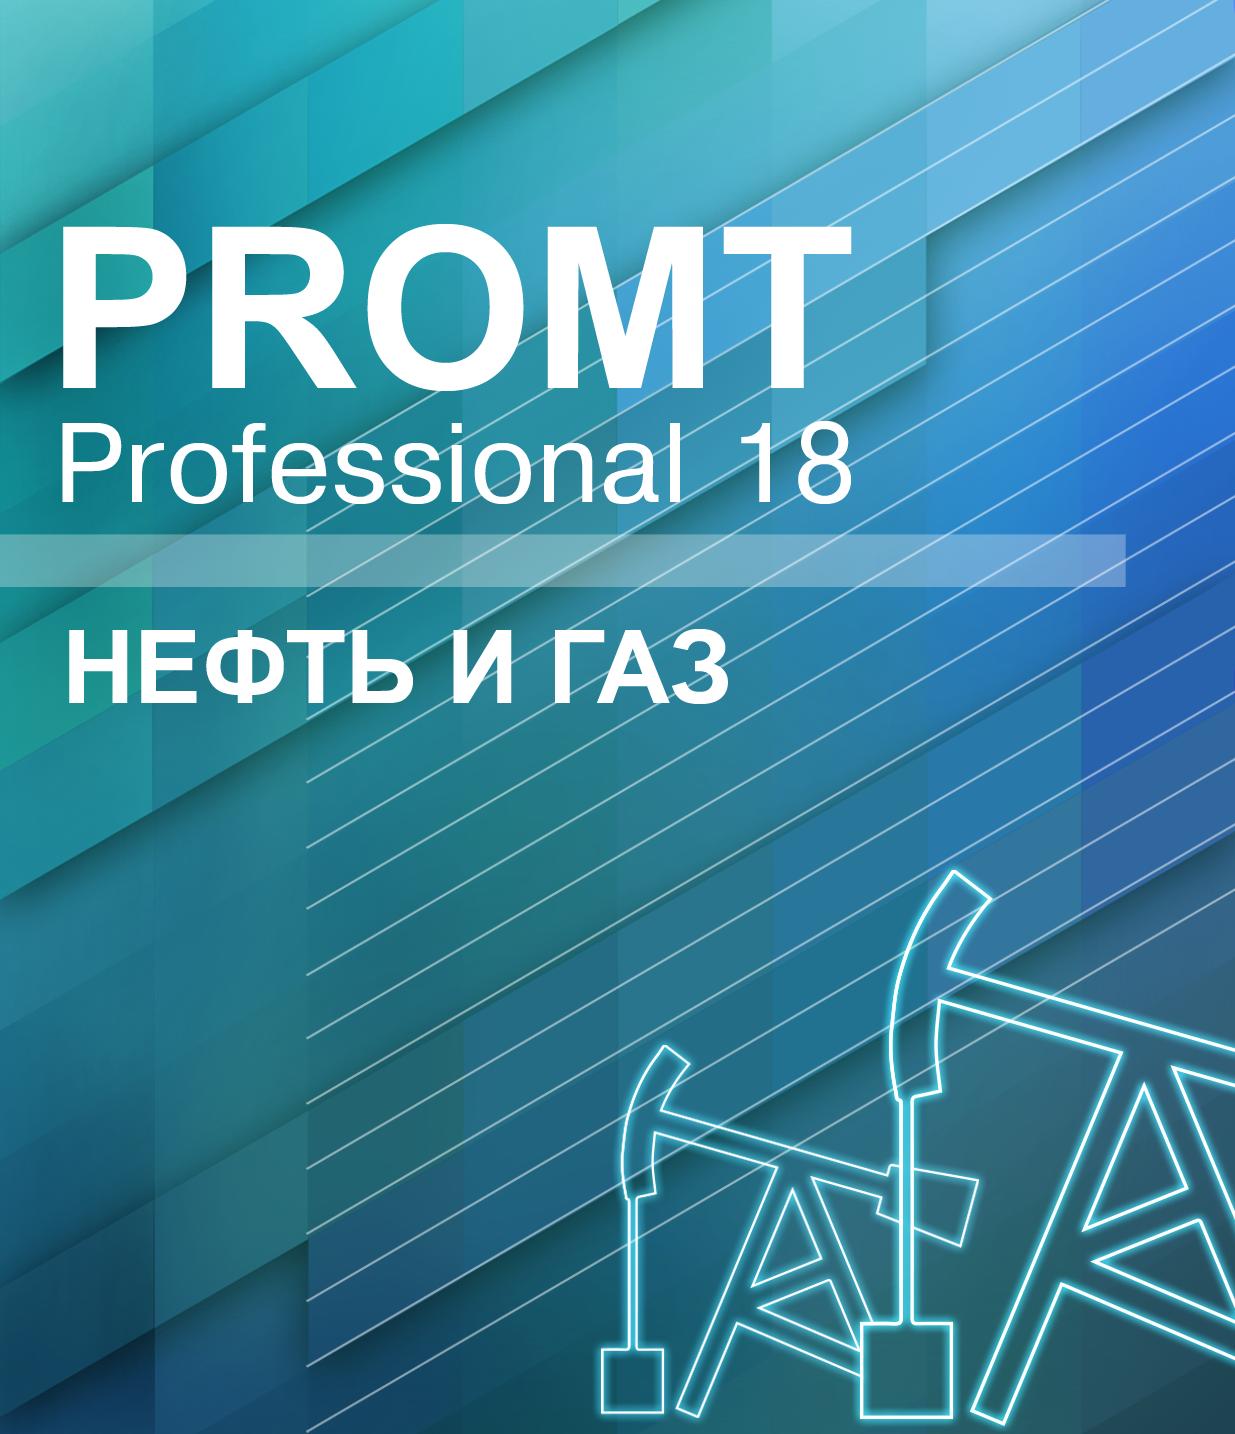 PROMT Professional 18 Нефть и Газ